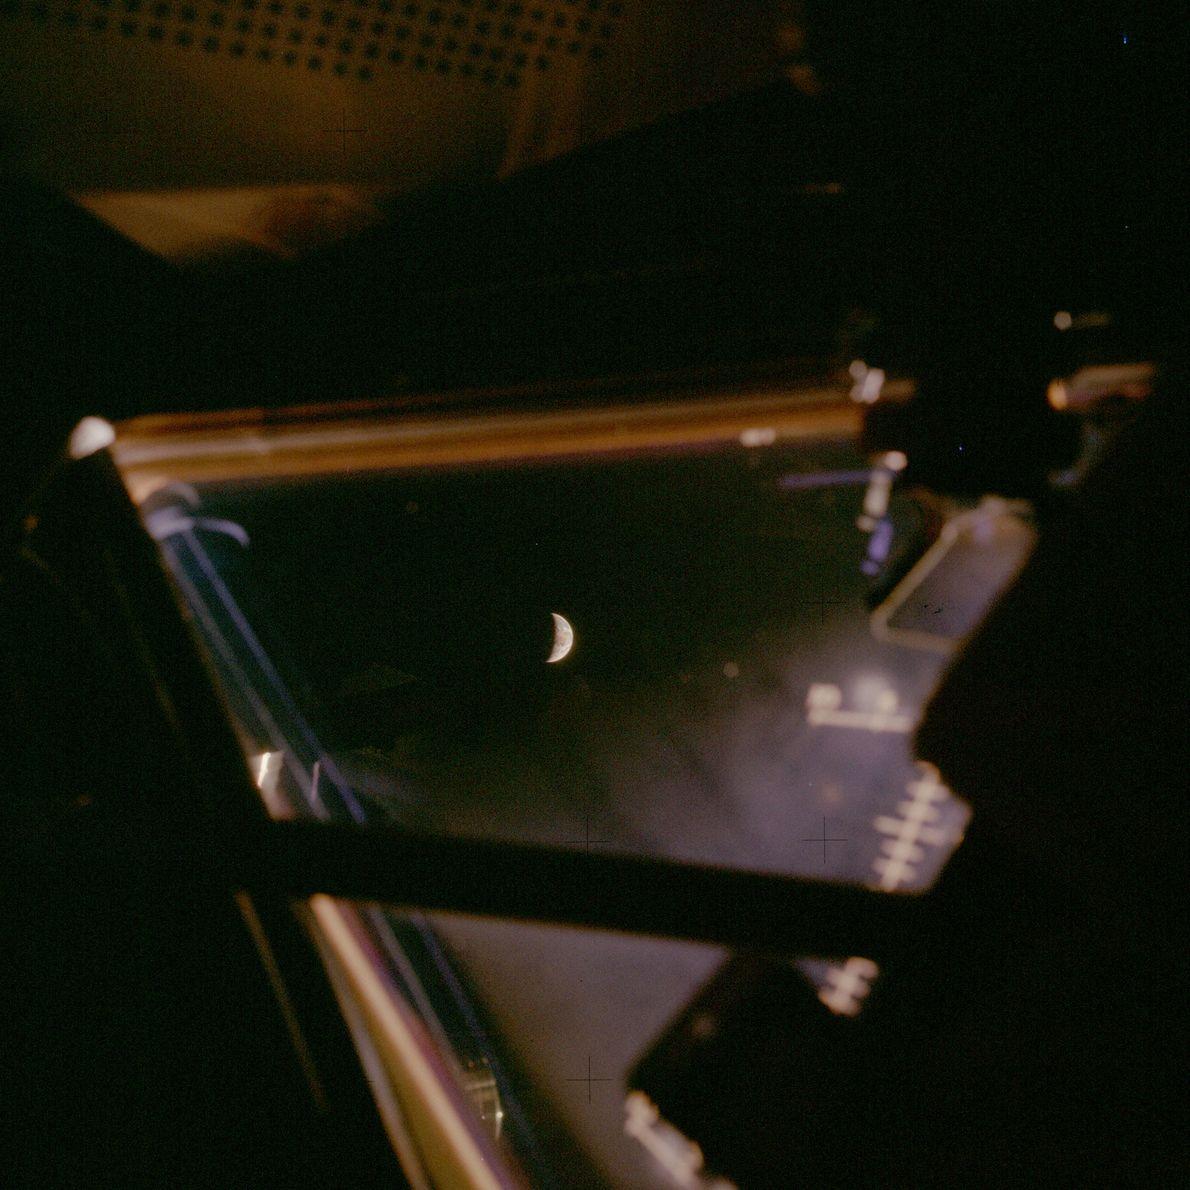 Earth seen from Apollo 13.